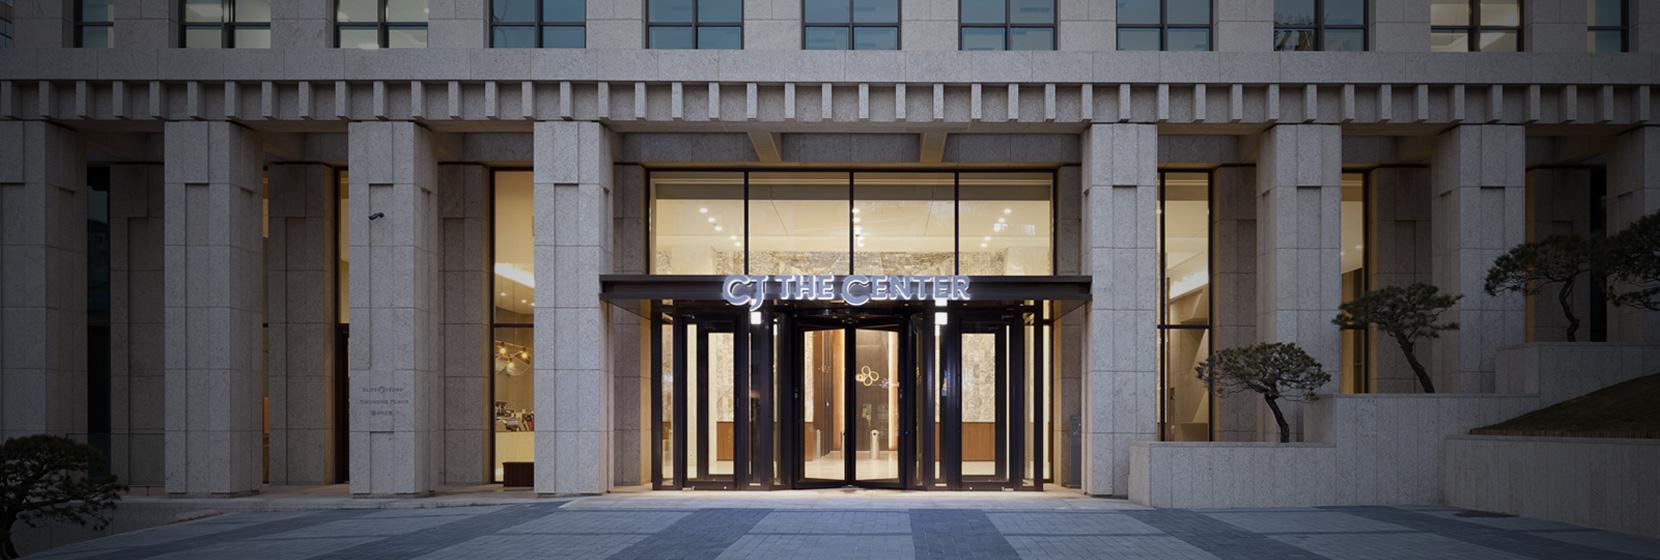 CJ Company image